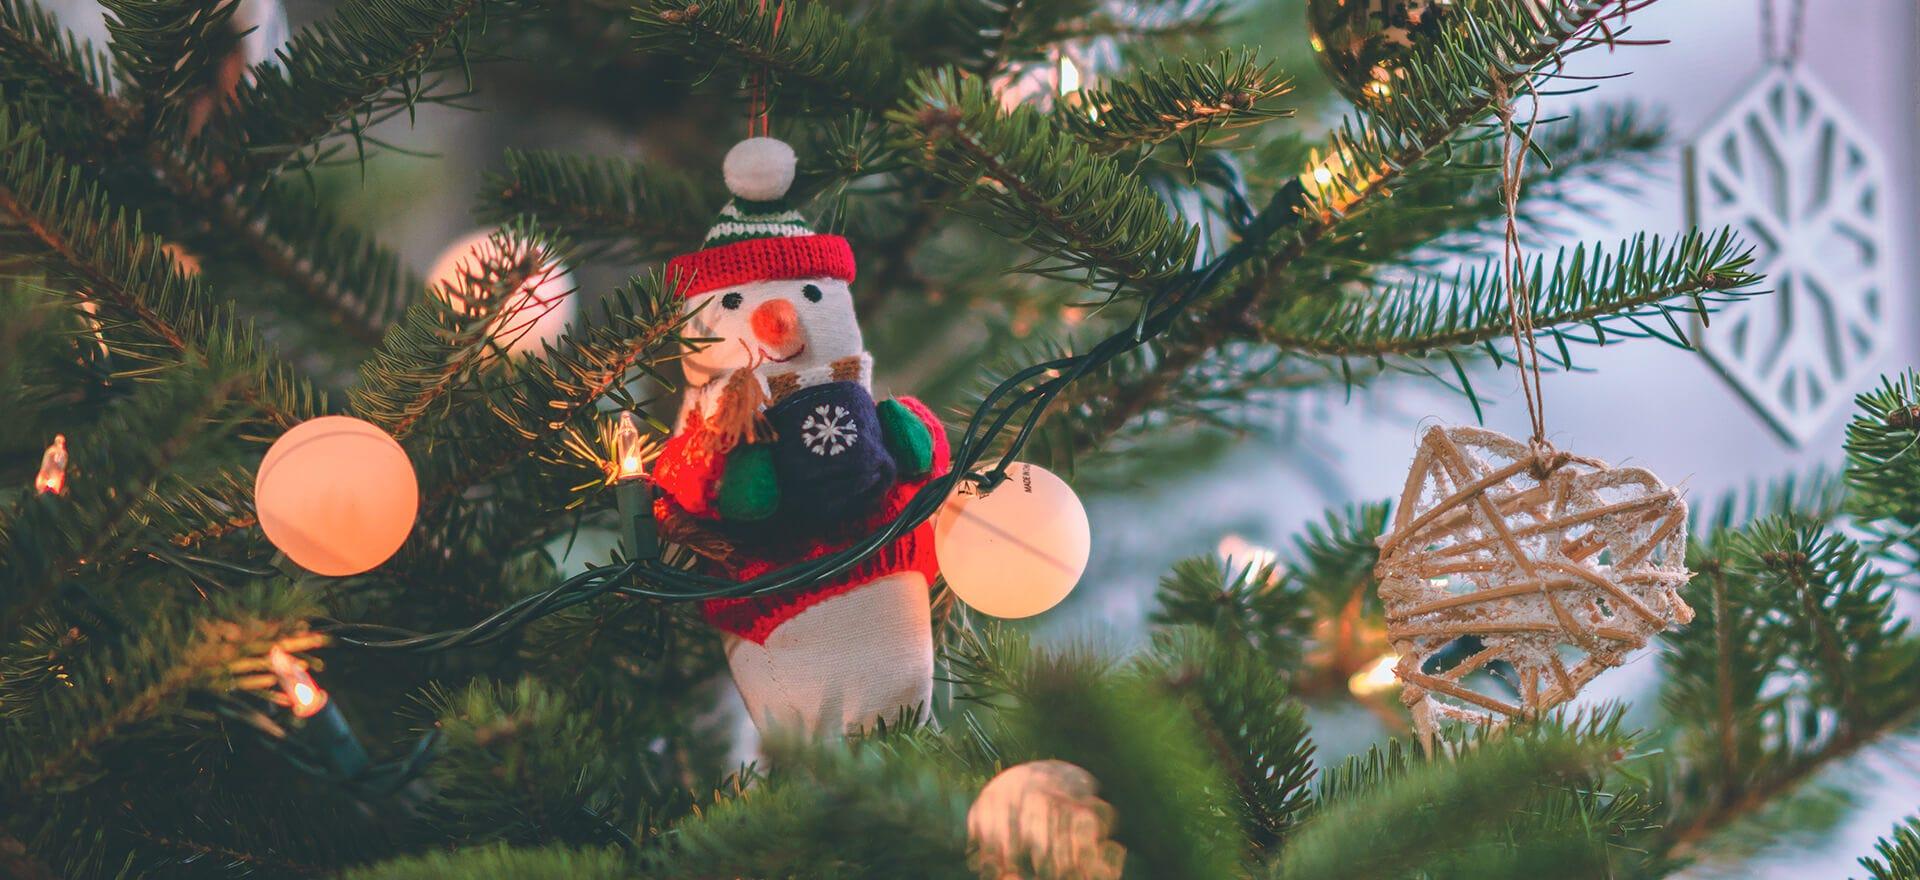 Christmas Tree Decoration Ideas